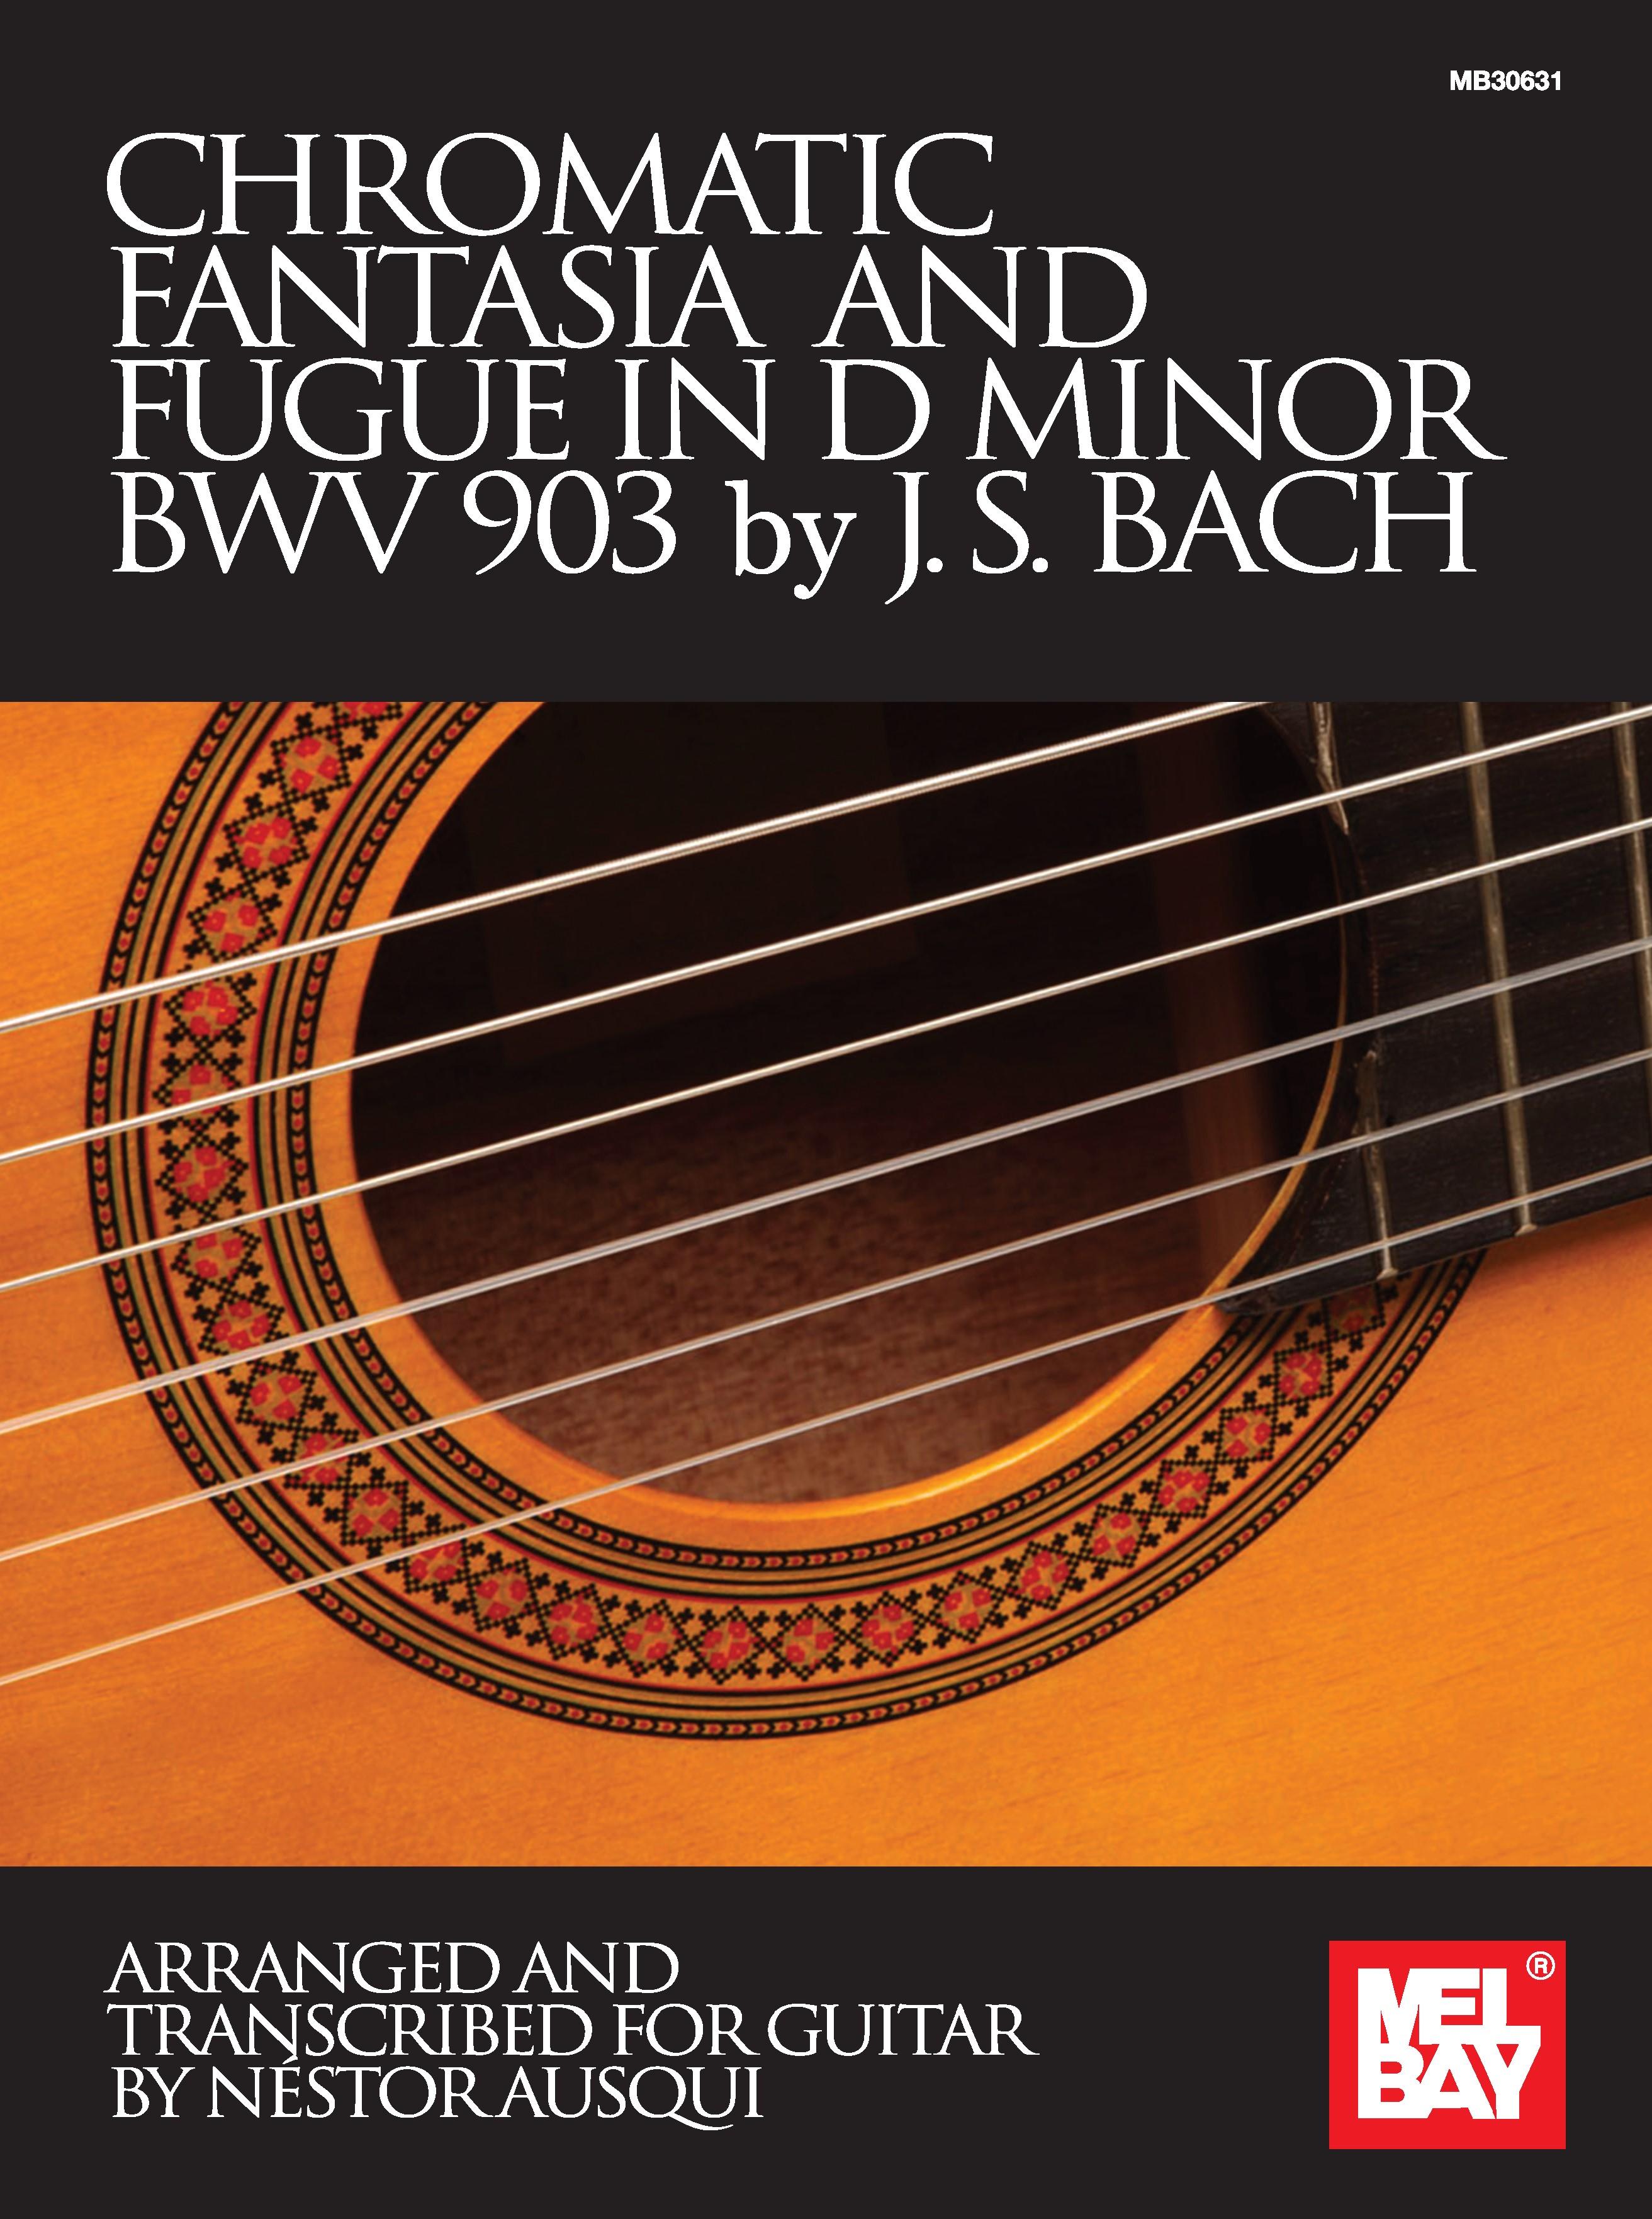 Johann Sebastian Bach: Chromatic Fantasia & Fugue In D Minor Bwv 903: Guitar: